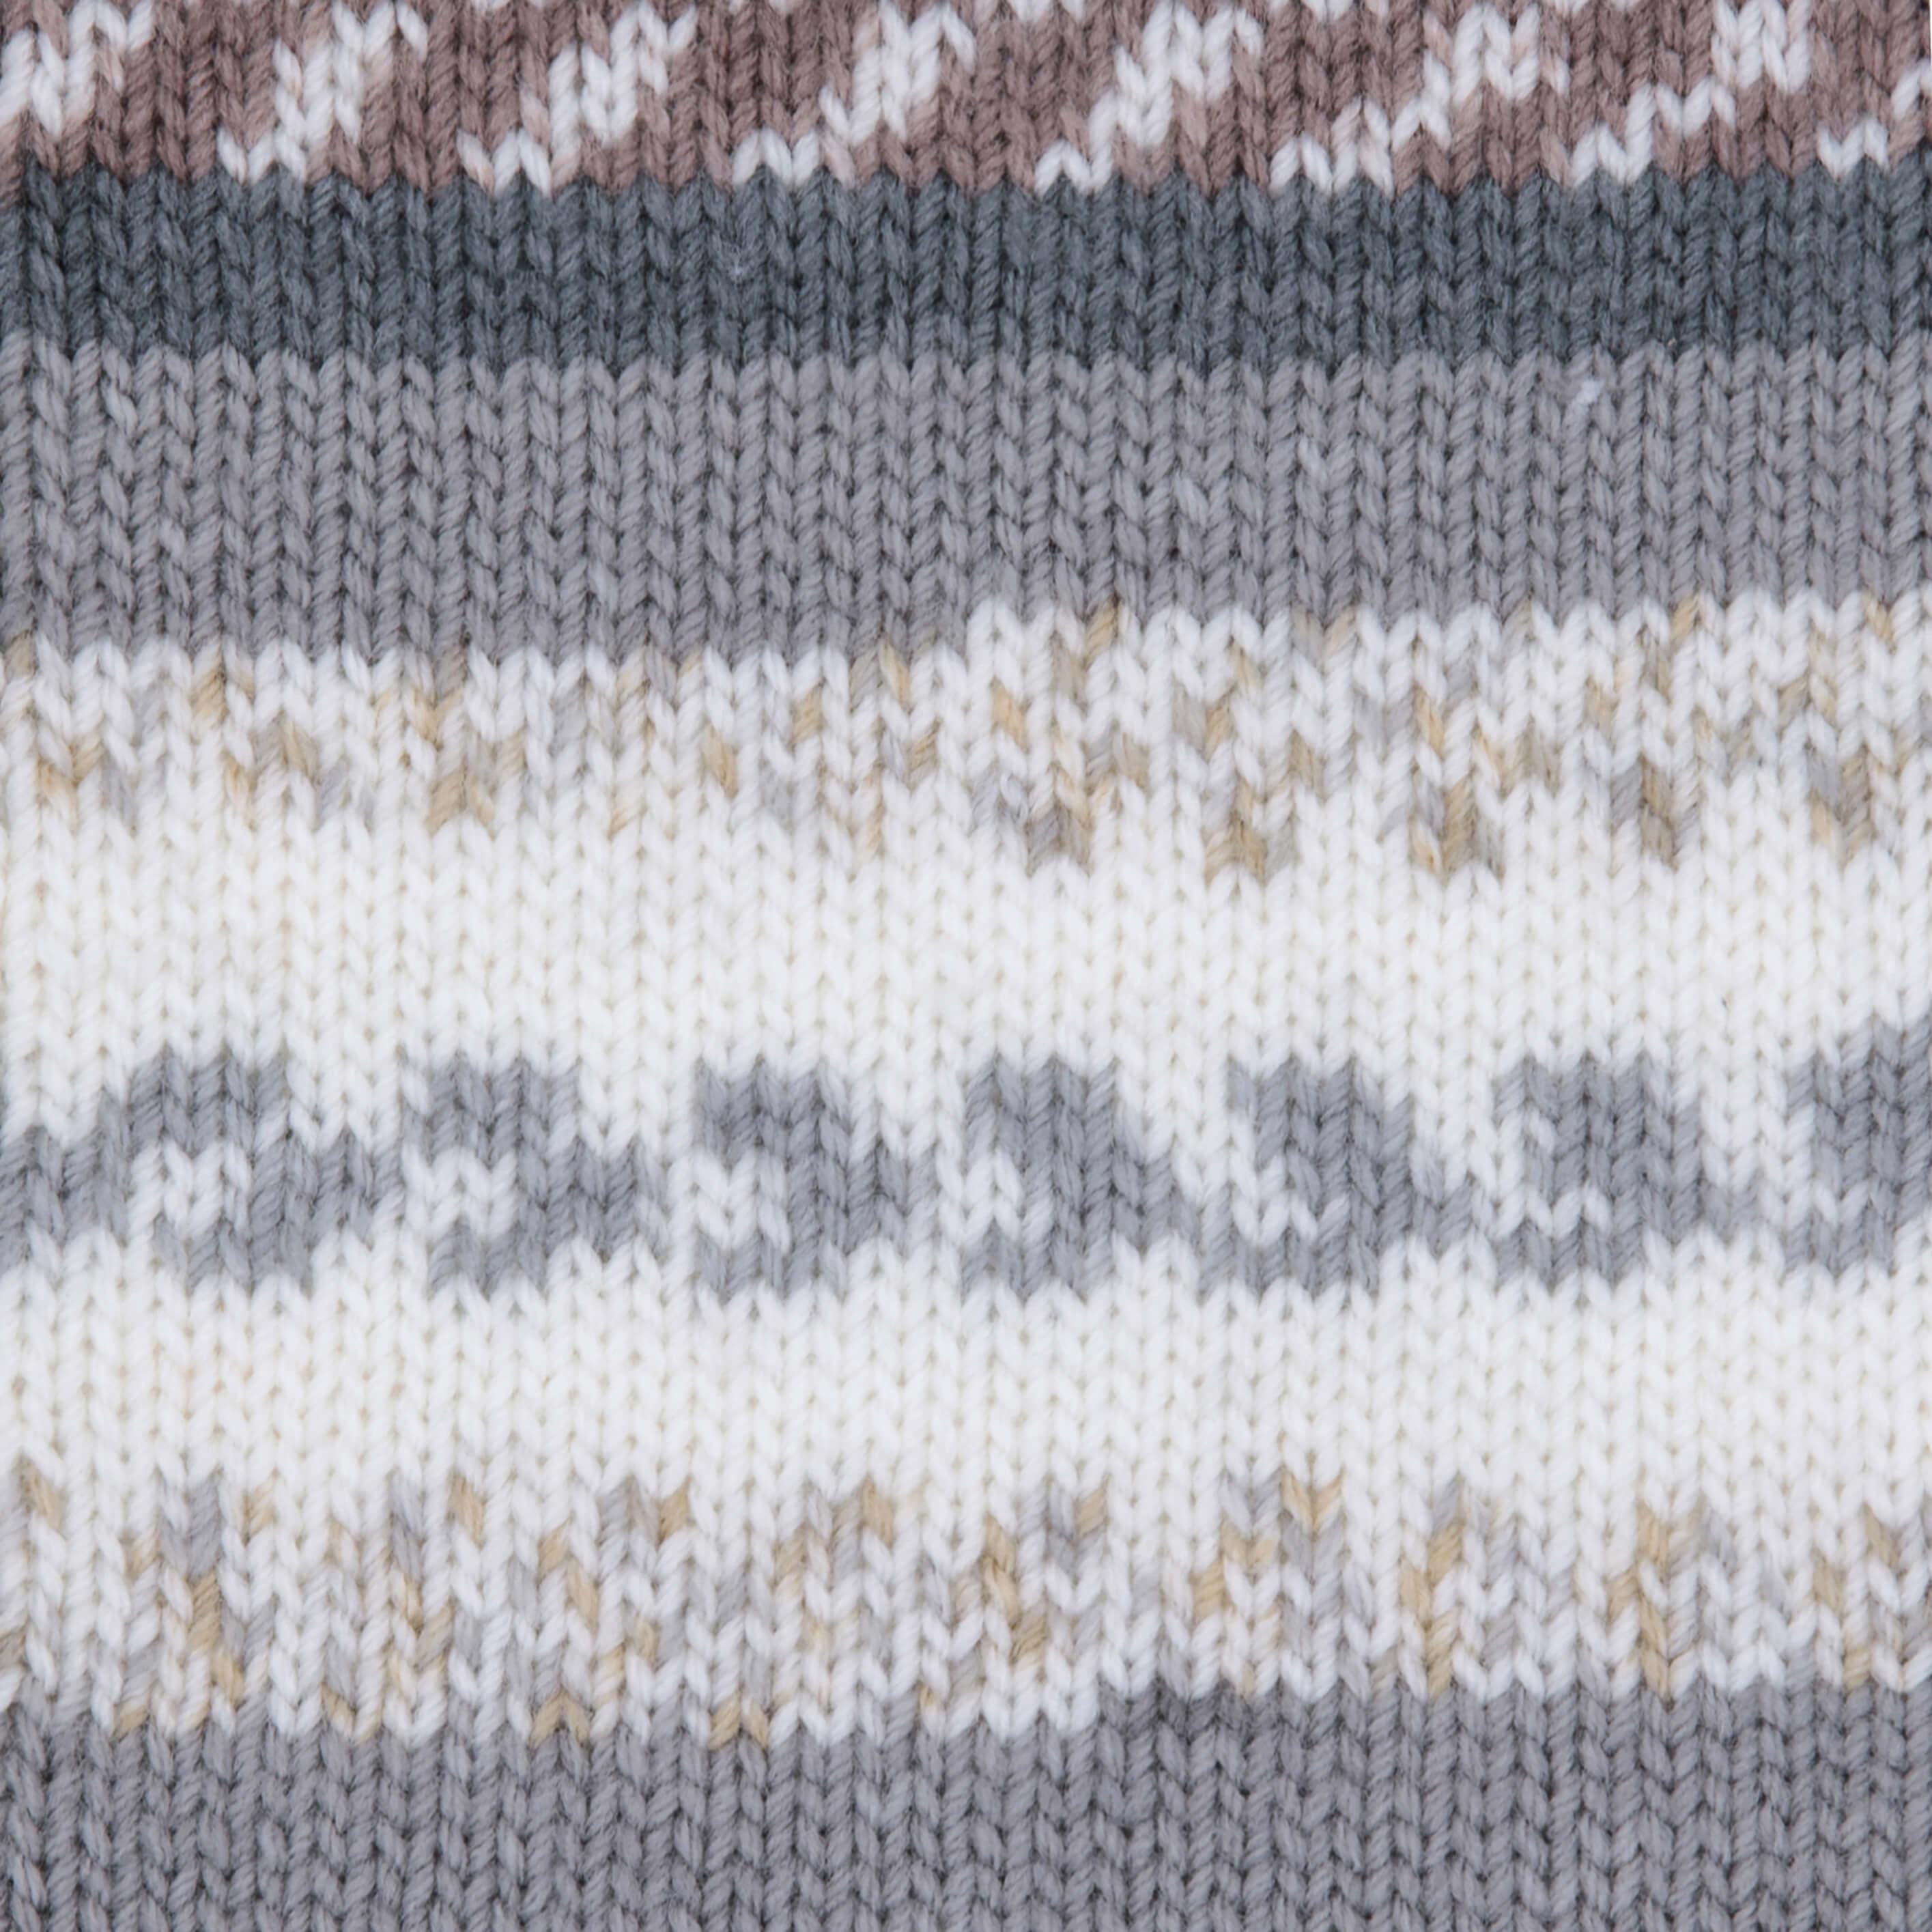 beigebraun grau  weiß rehbraun multicolor